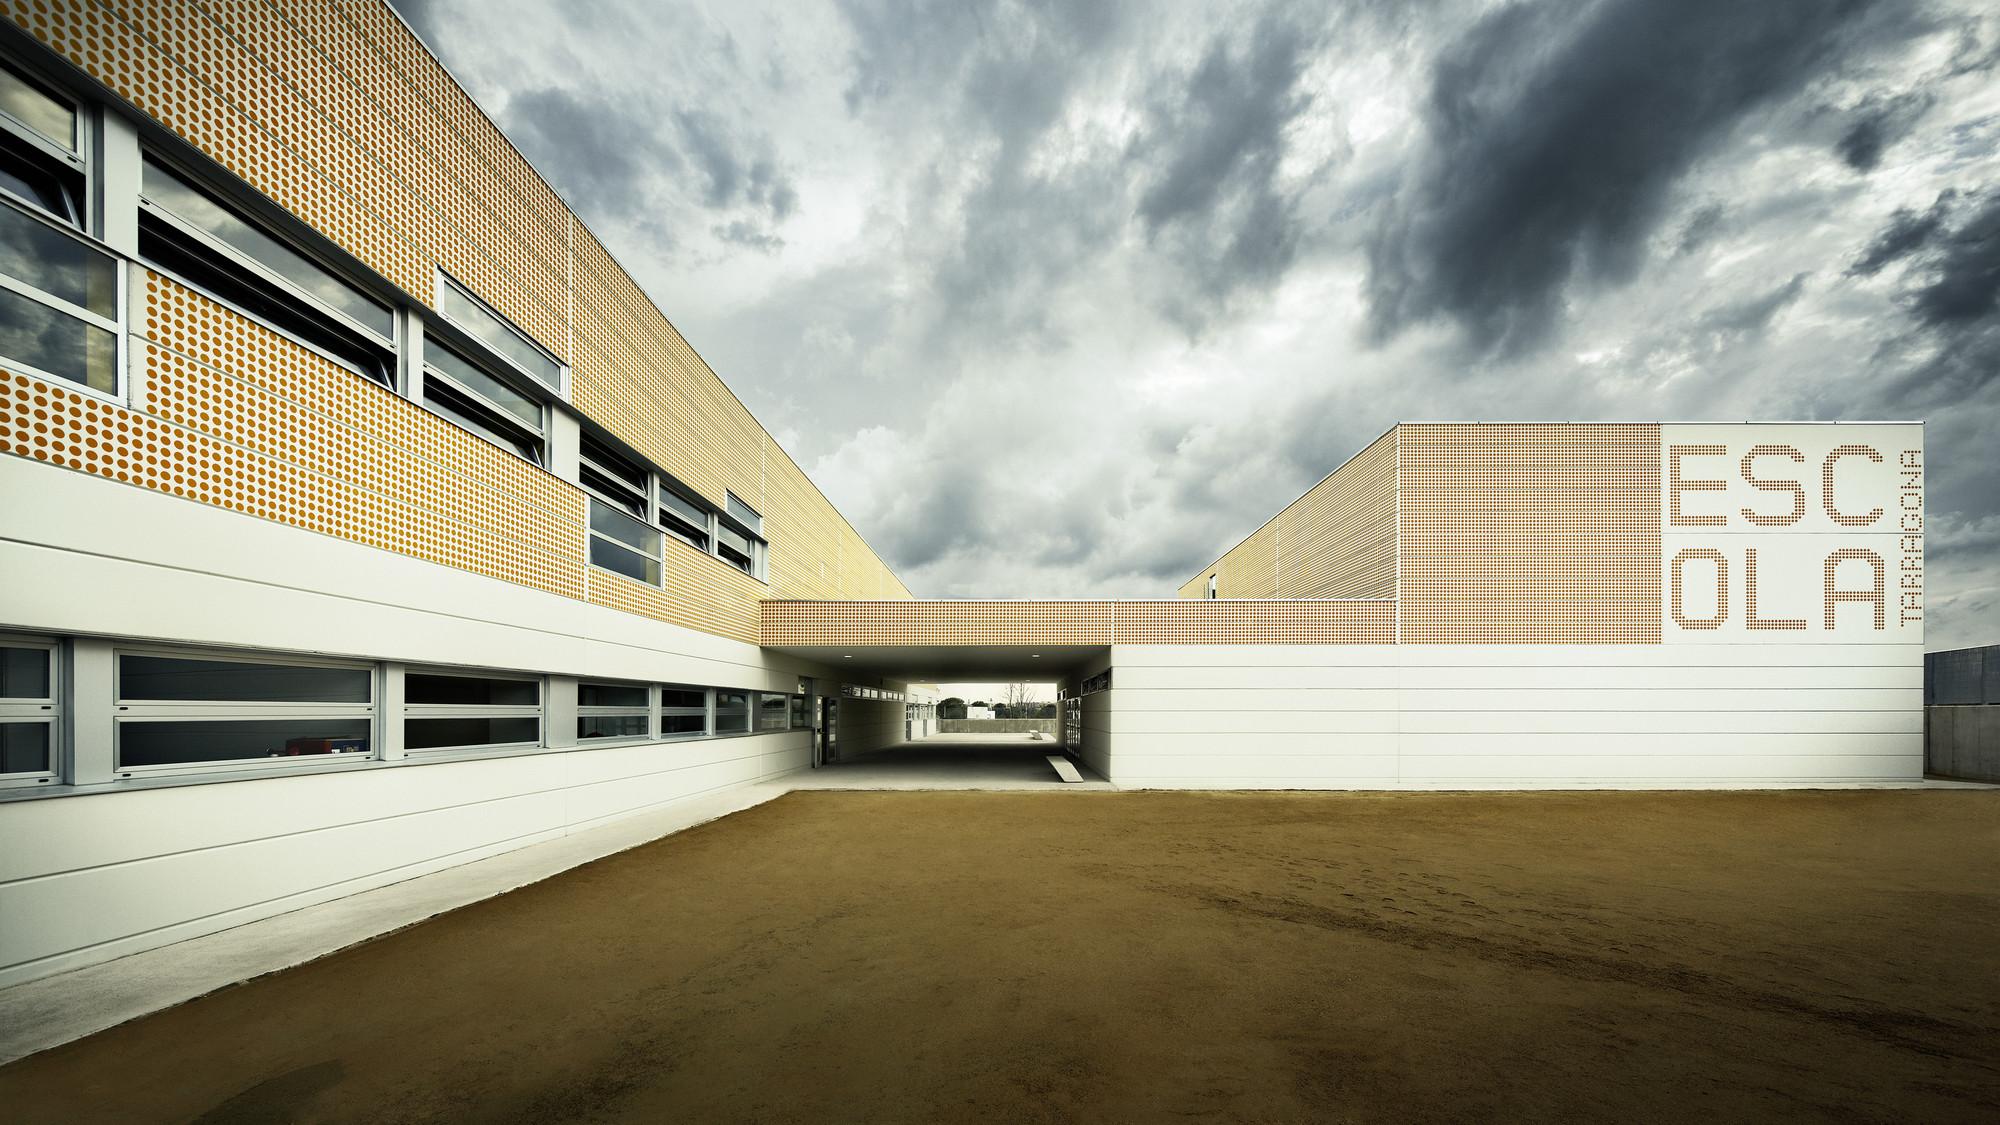 School in Tarragona / Batlle i Roig Arquitectes, Courtesy of Batlle i Roig